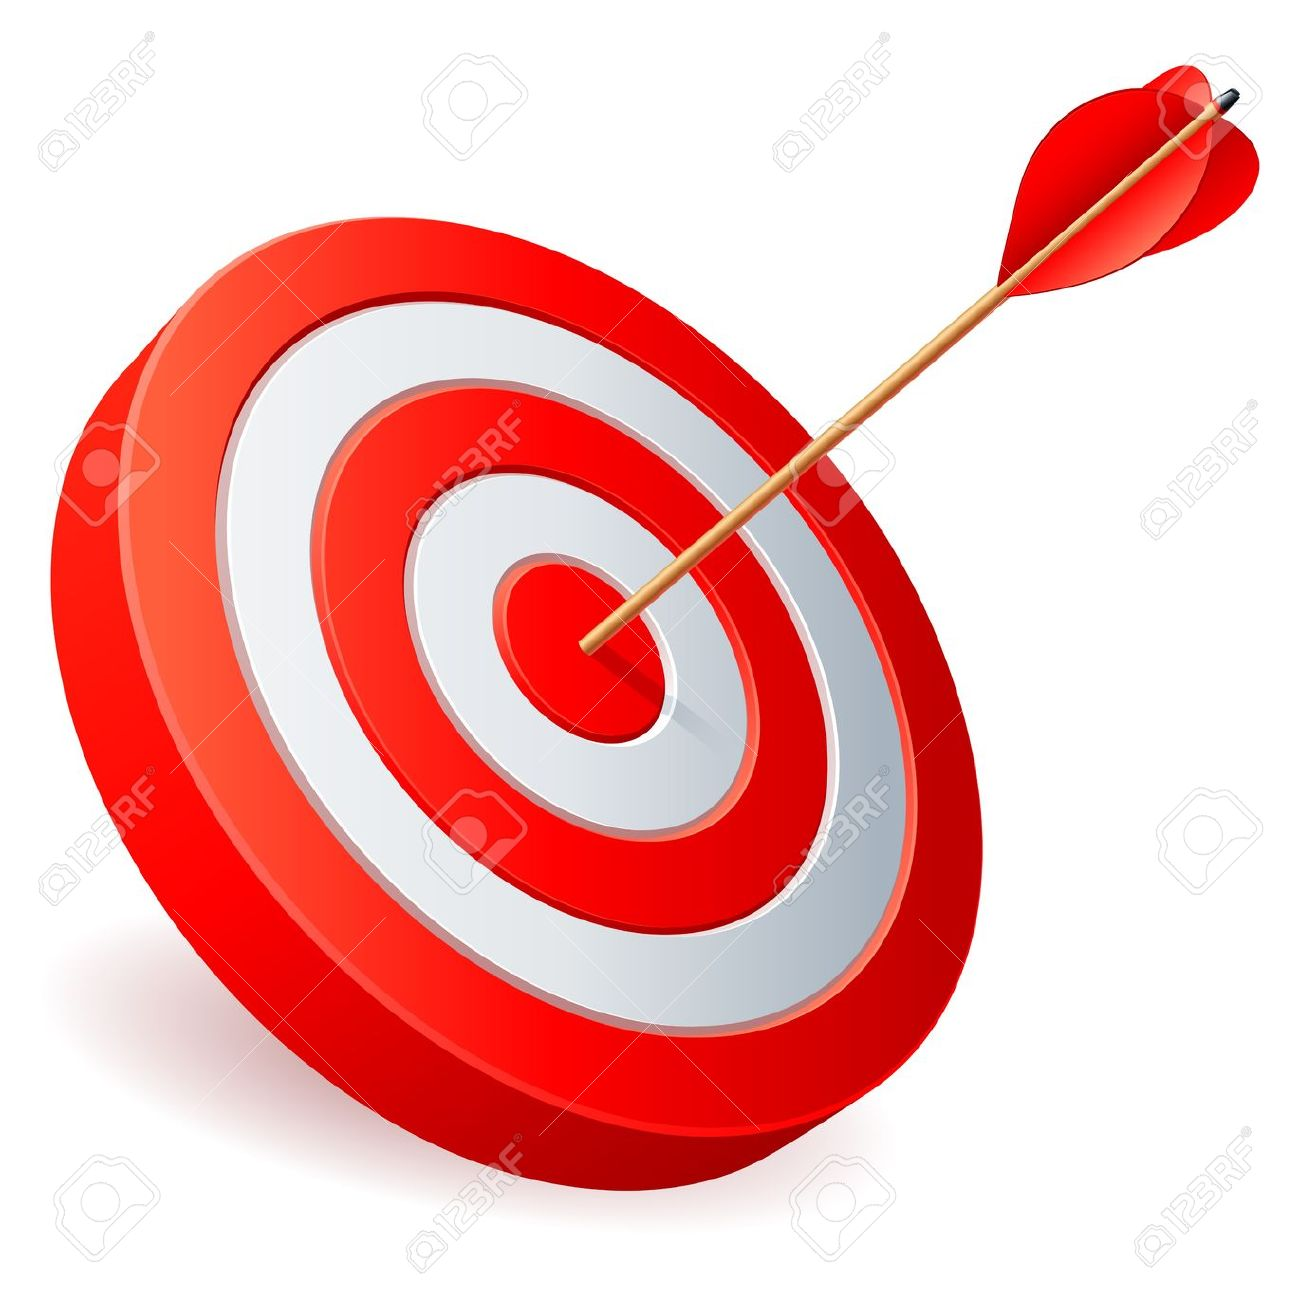 Target Clip Art Bullseye | Clipart Panda - Free Clipart Images